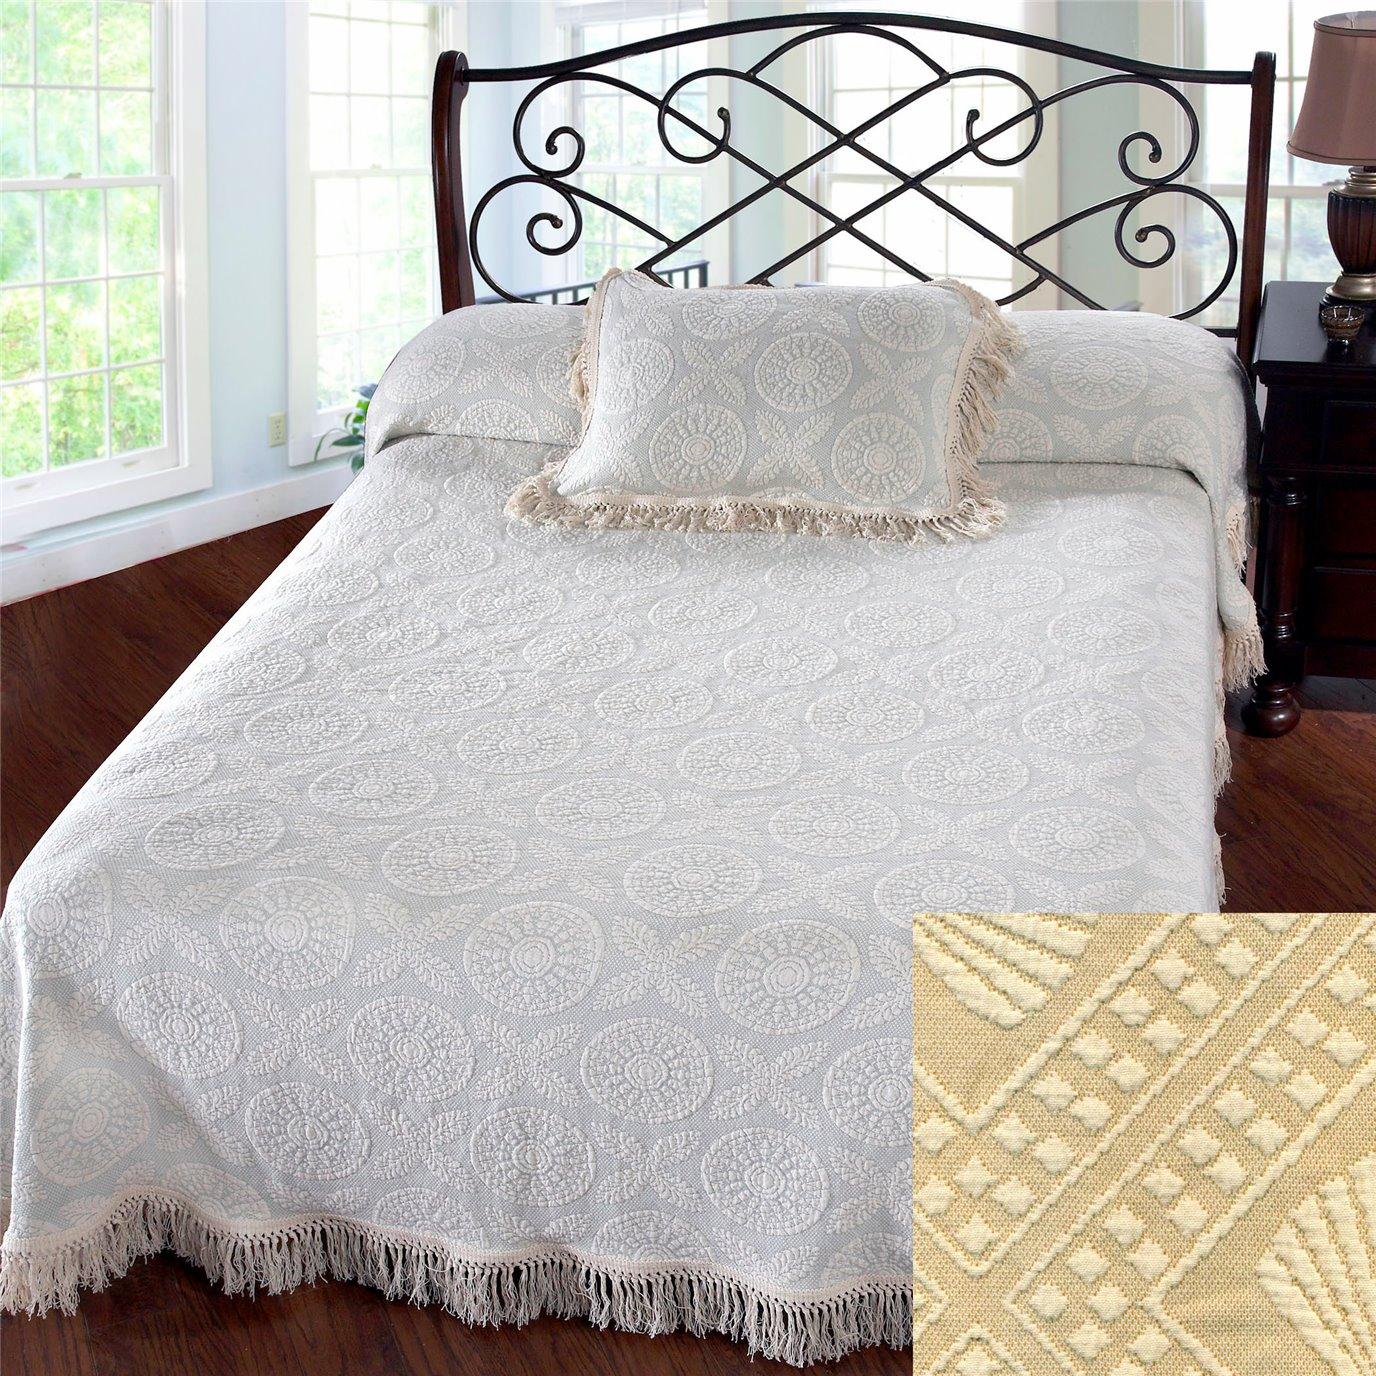 Heirloom Twin Linen Bedspread